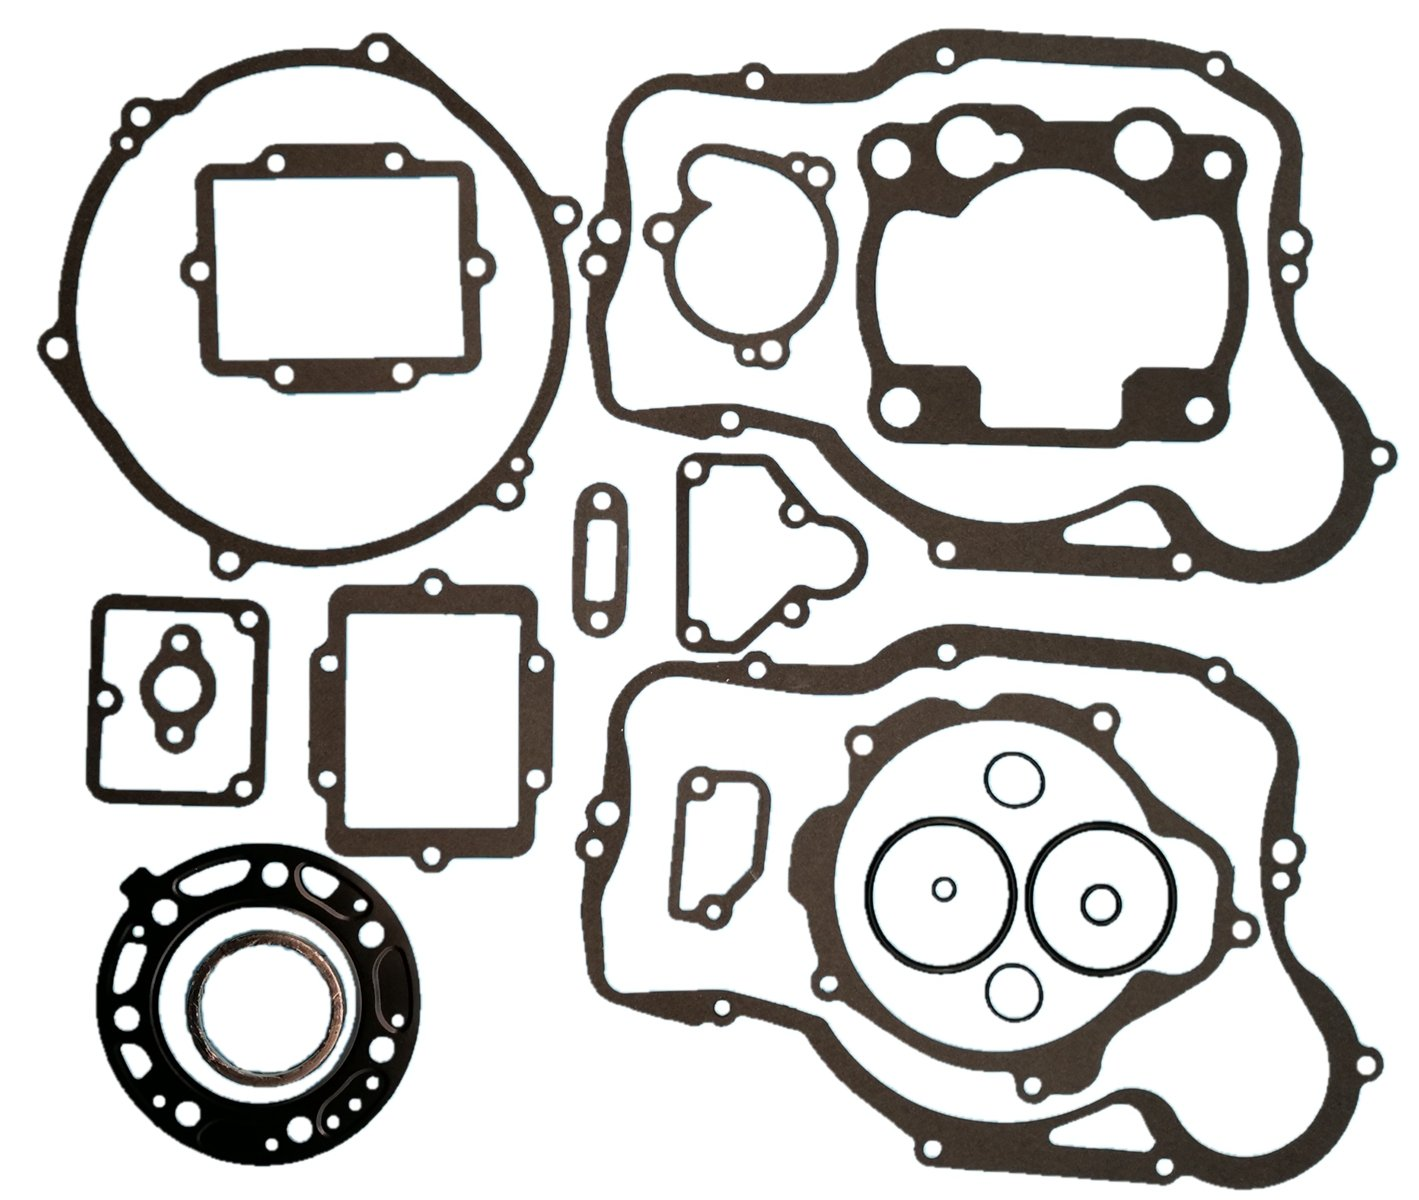 Tuzliufi Replace Complete Top End Gasket Set kit Yamaha YZ80 YZ 80 1993 1994 1995 1996 1997 1998 1999 2000 2001 2002 YZ85 YZ 85 2002 2003 2004 2005 2006 2007 2008 2009 2010 2011 2012 2013-2018 New Z87